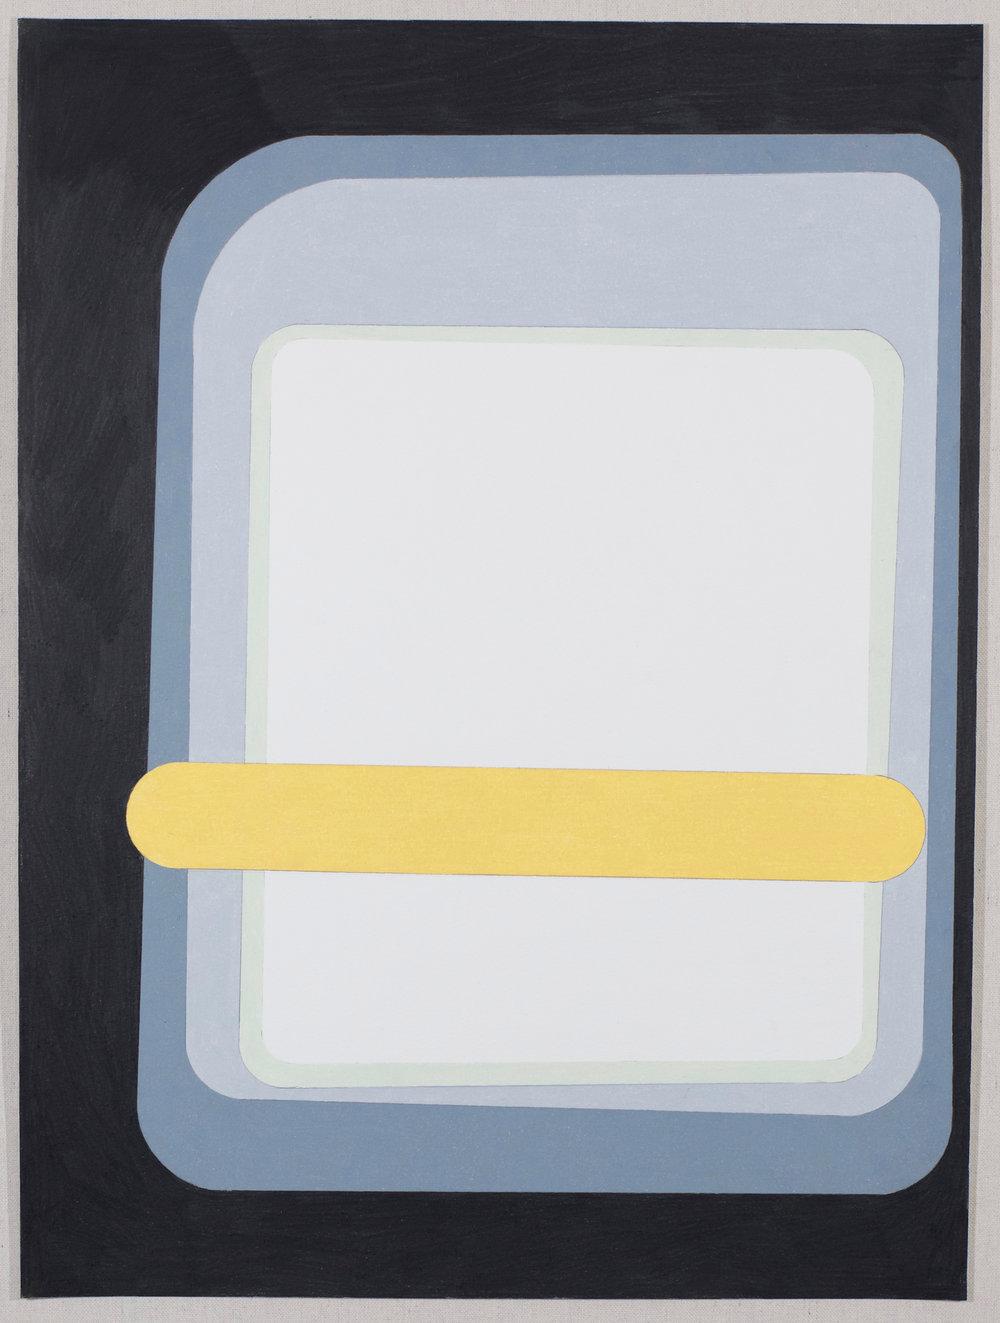 Untitled study #1, 2017